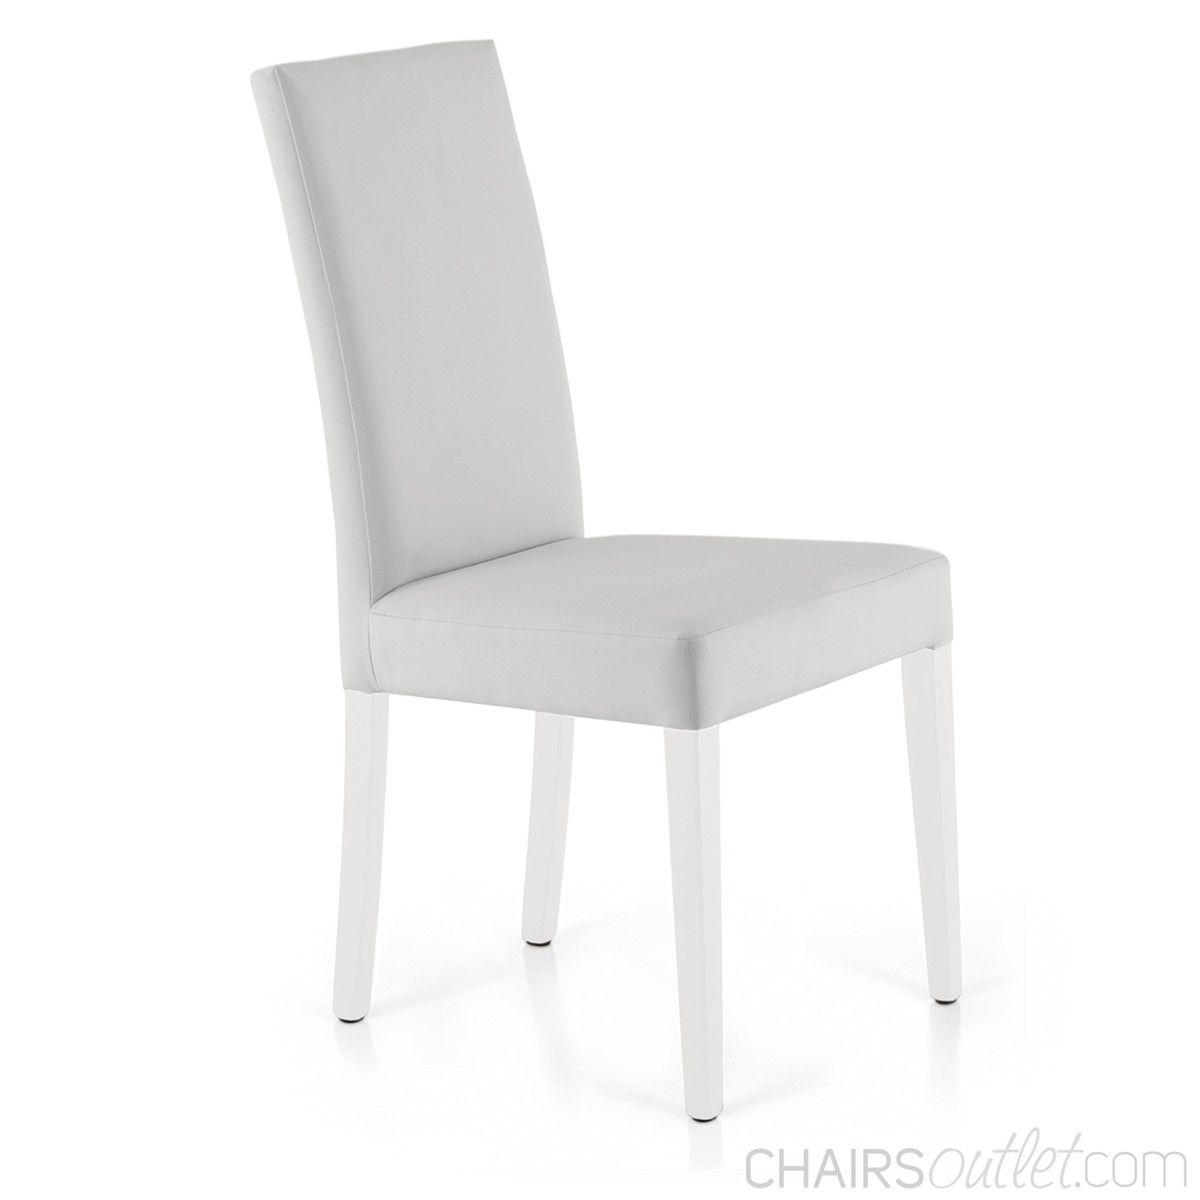 Sedie In Vera Pelle Per Sala Da Pranzo.Sedia Classica Da Sala Da Pranzo Sedia In Legno Di